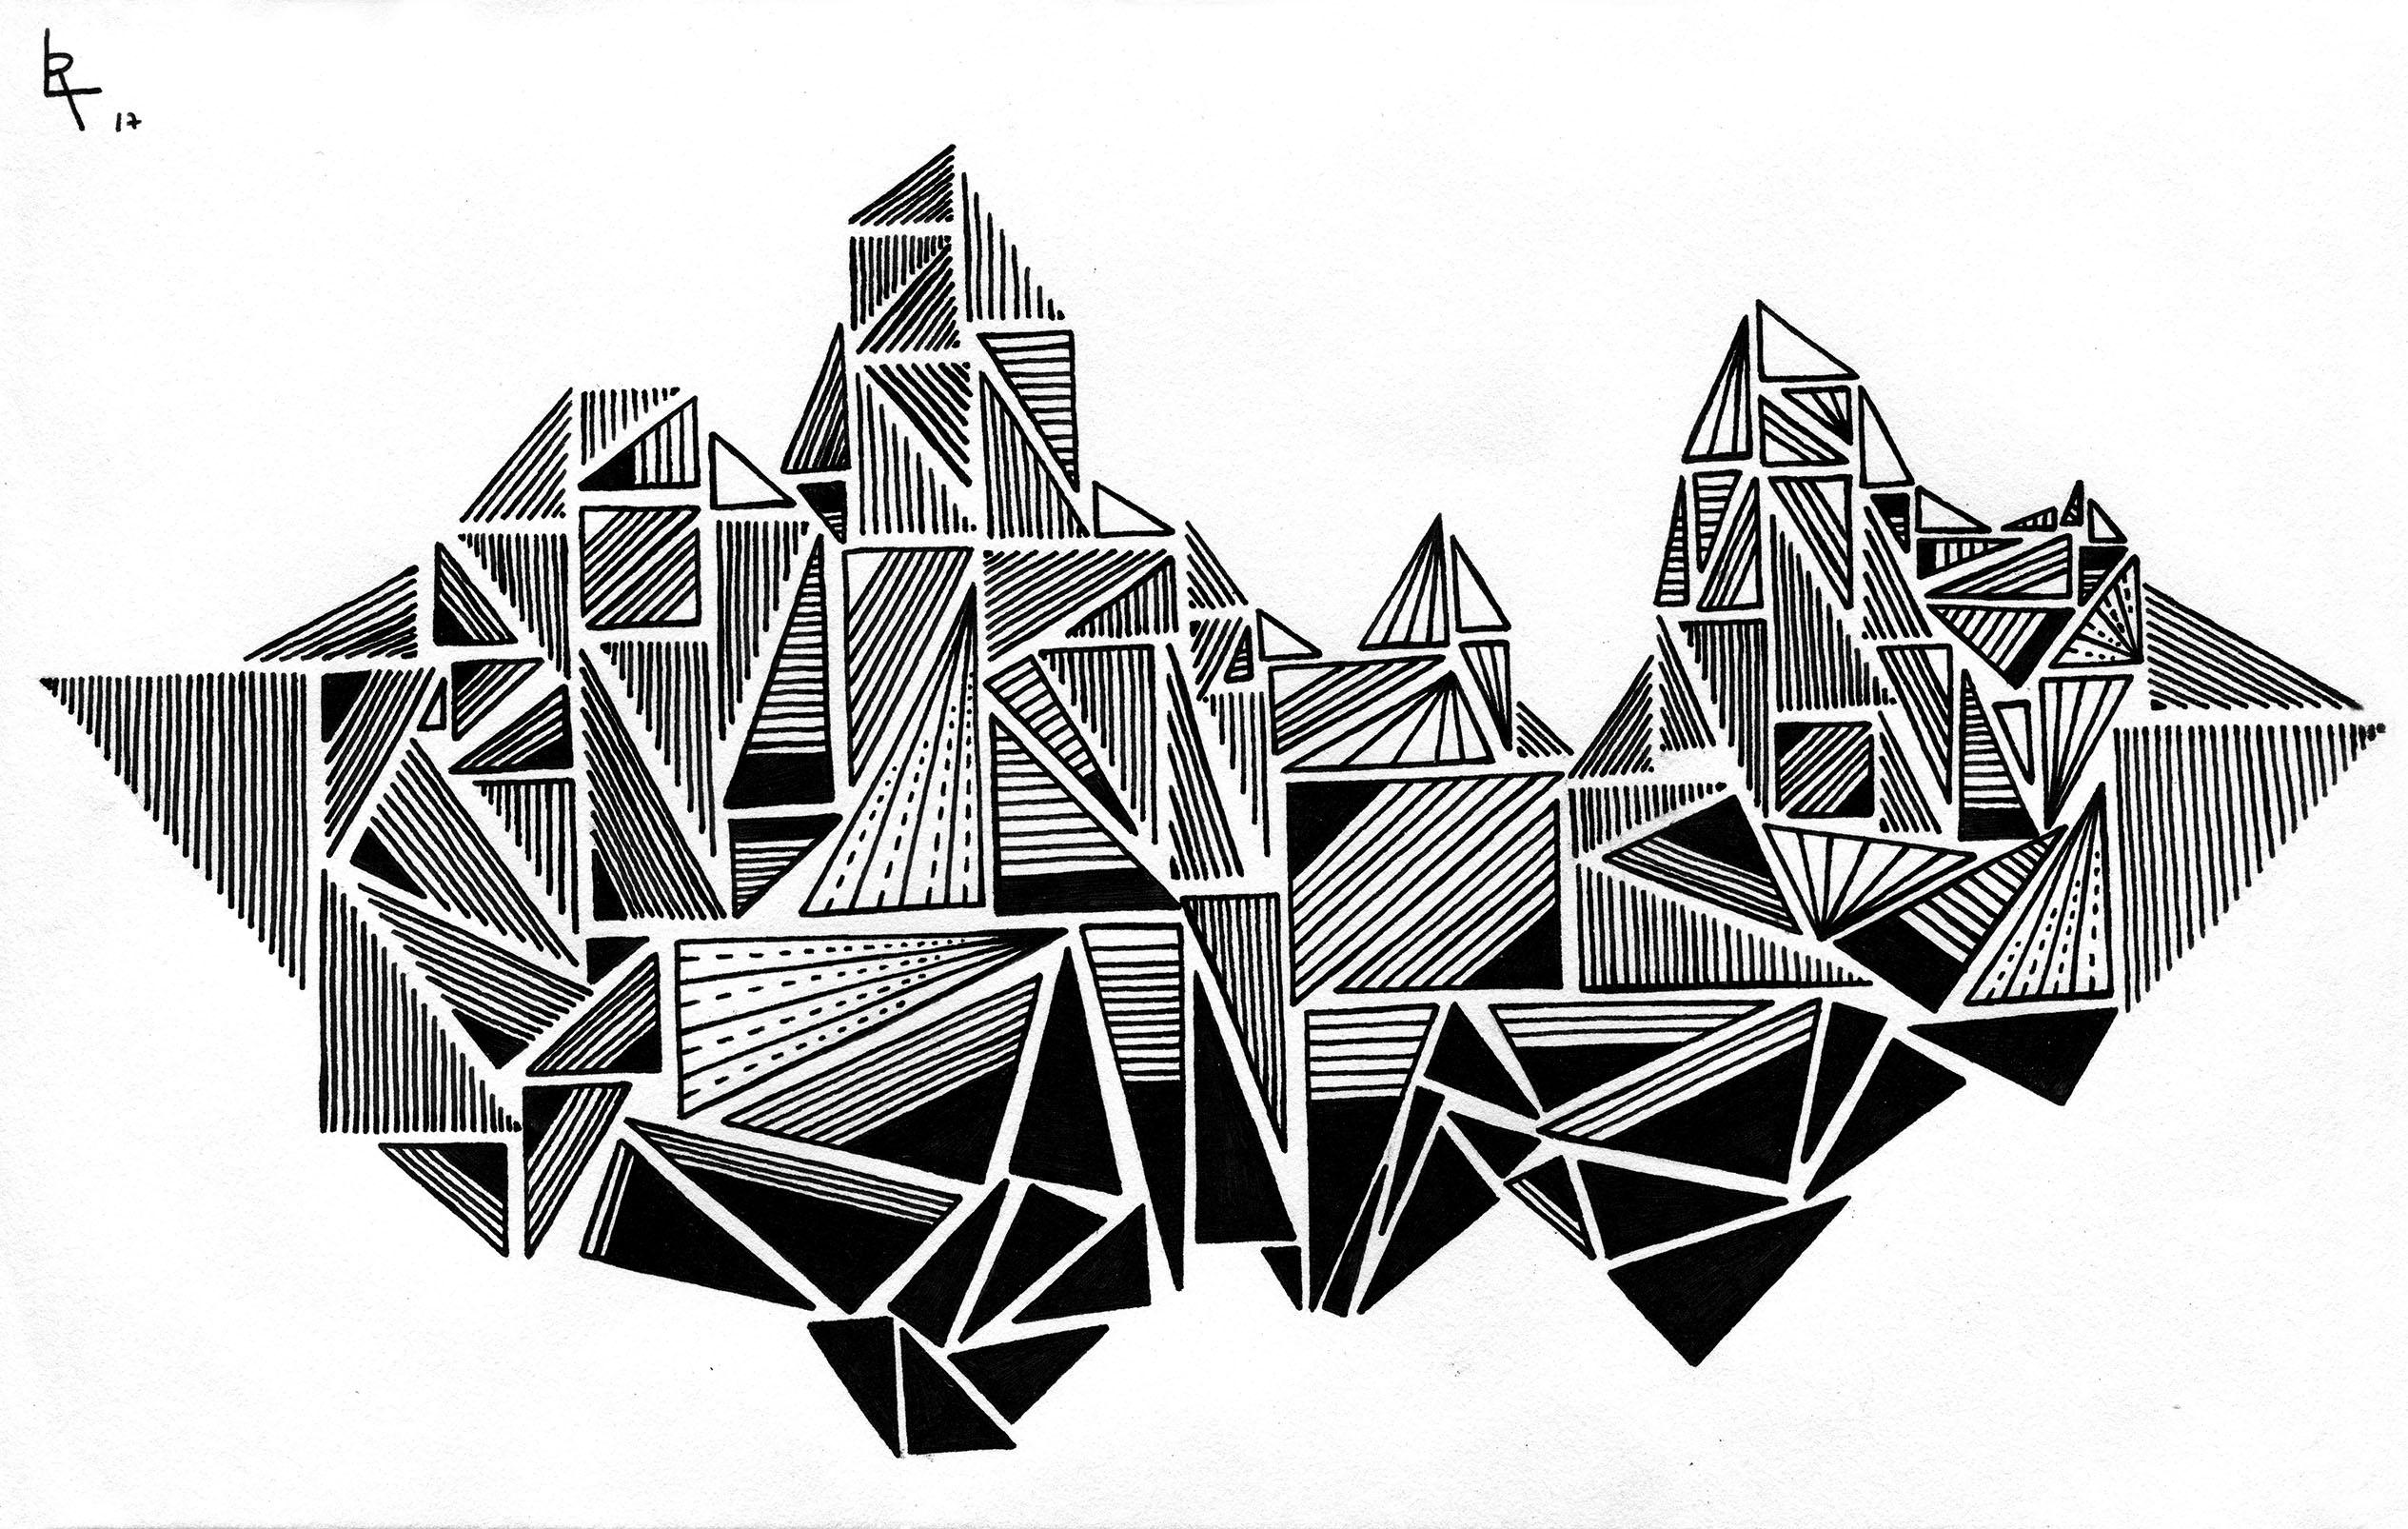 Serie: Fractales